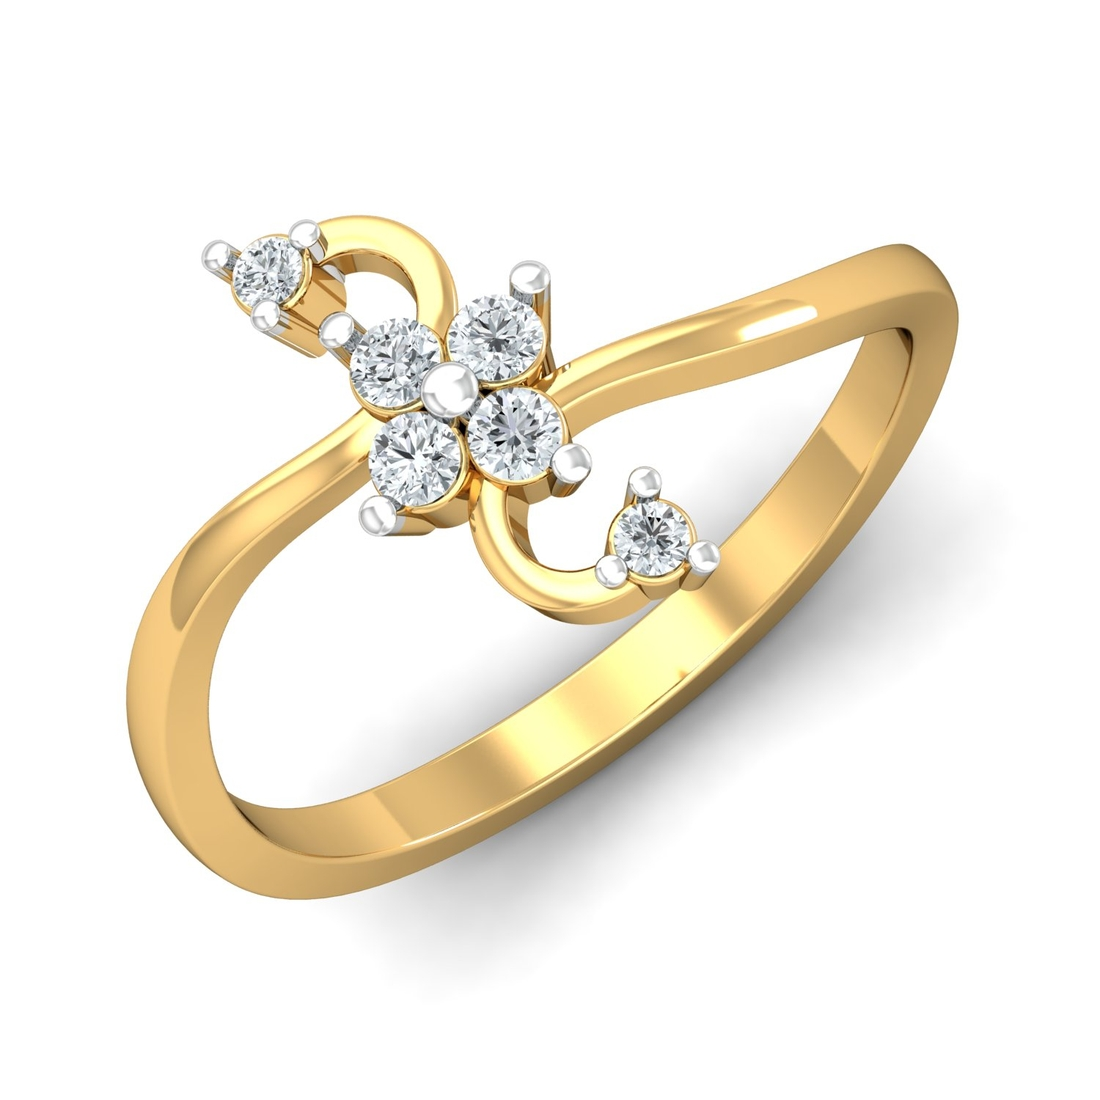 Arkina Diamond's twisted stylish floral ring